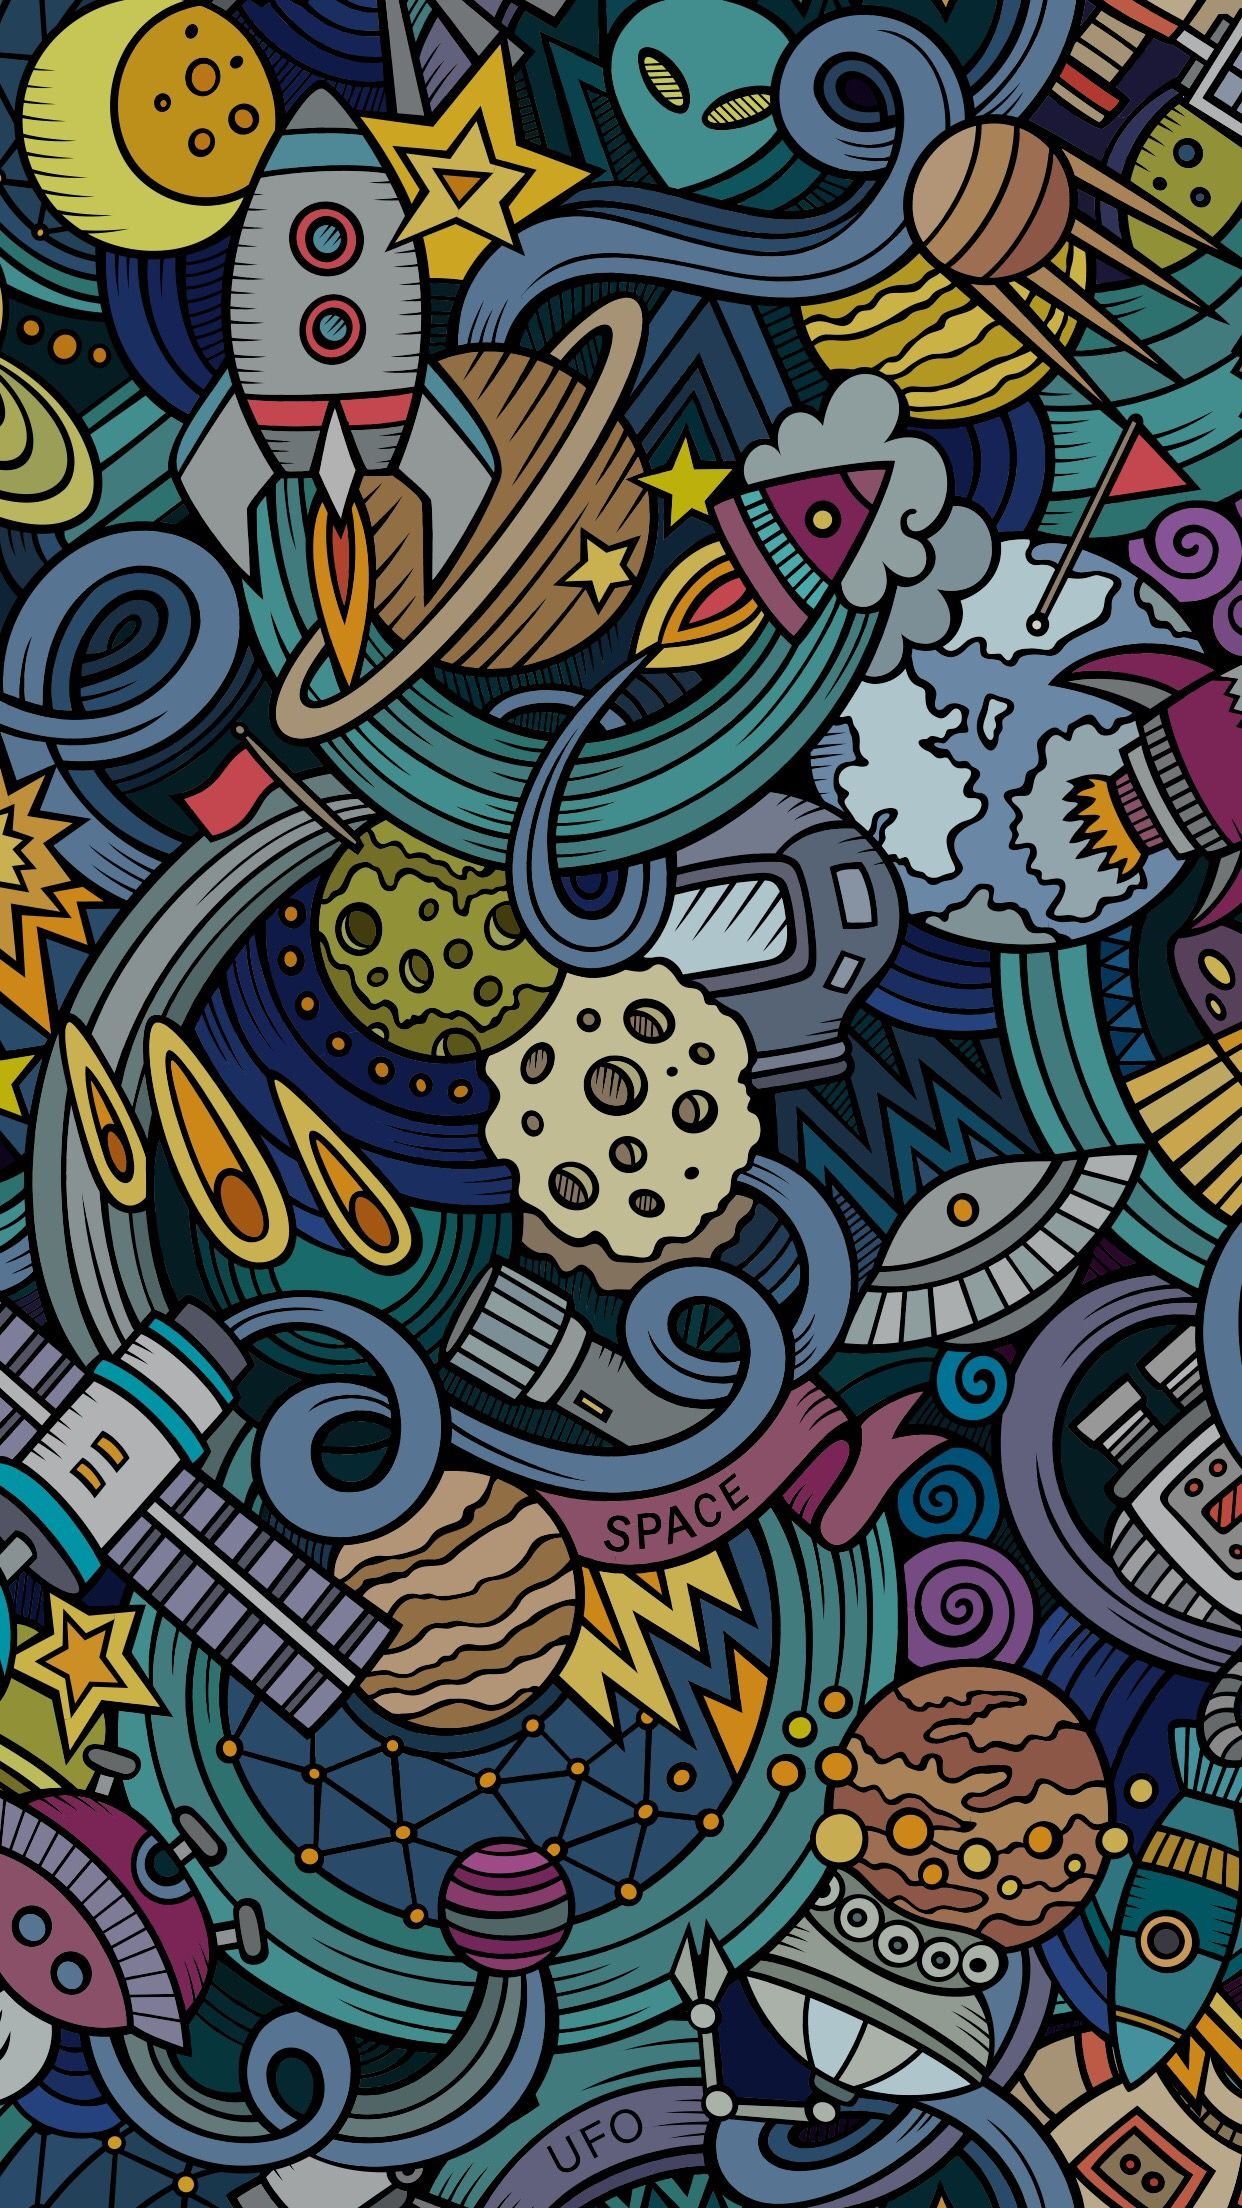 Space wallpaper fonditos chidos Iphone wallpaper Screen 1242x2208